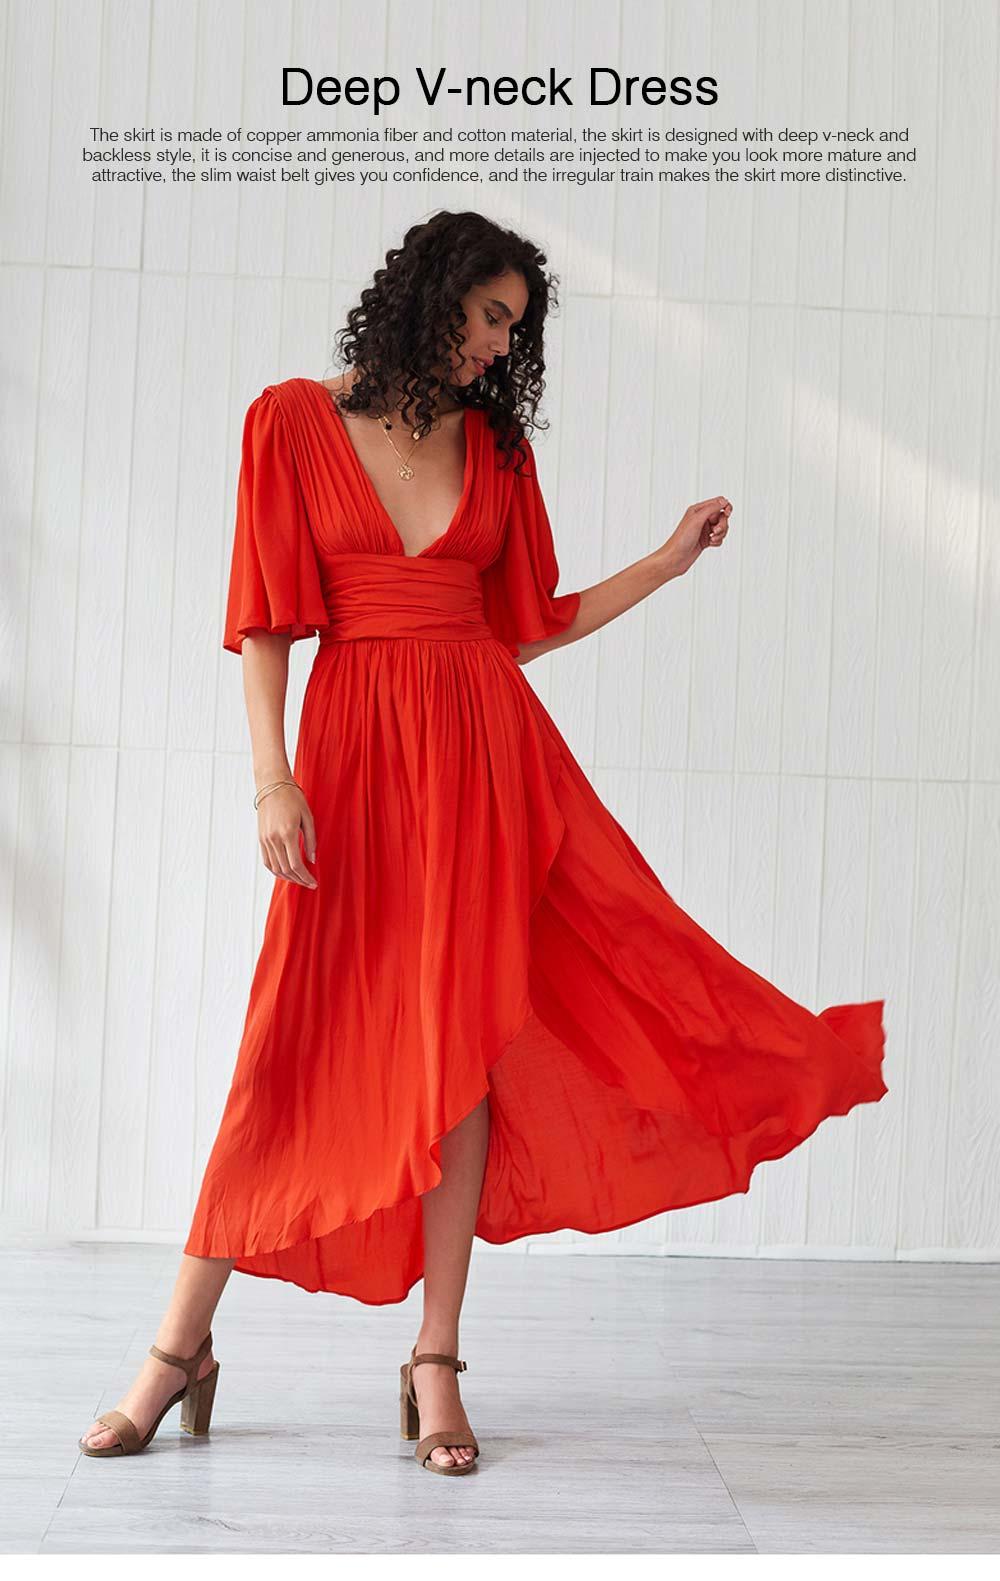 Deep V-neck Bohemian Dress Slim Waist Belt Irregular Style Orange Skirt Maxi Dress Summer for Women 0